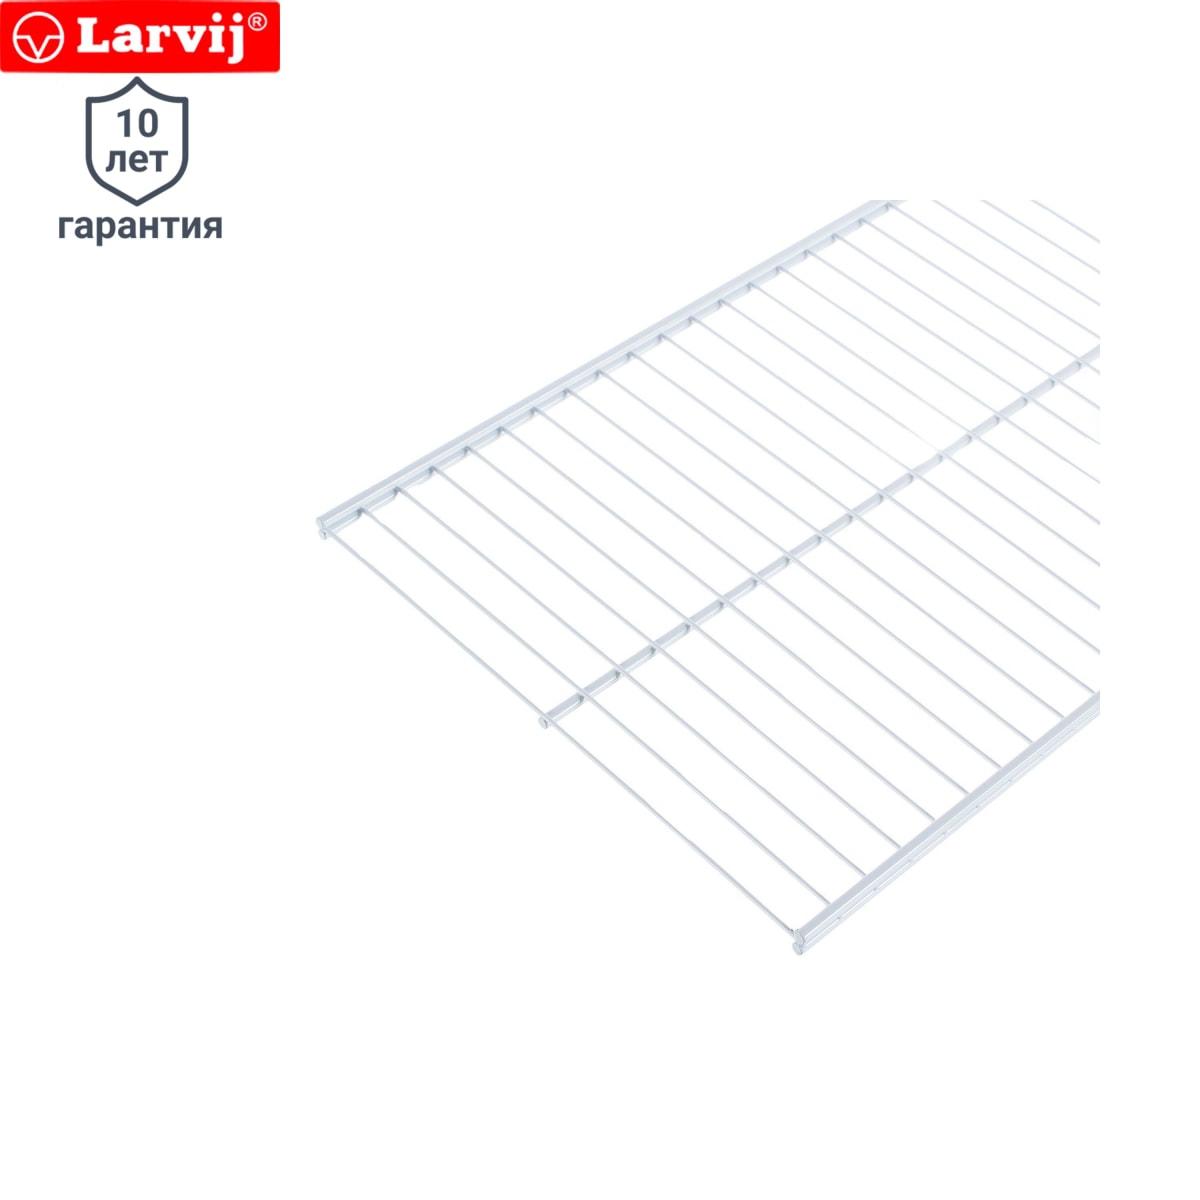 Полка сетчатая Larvij 903х306 мм цвет белый